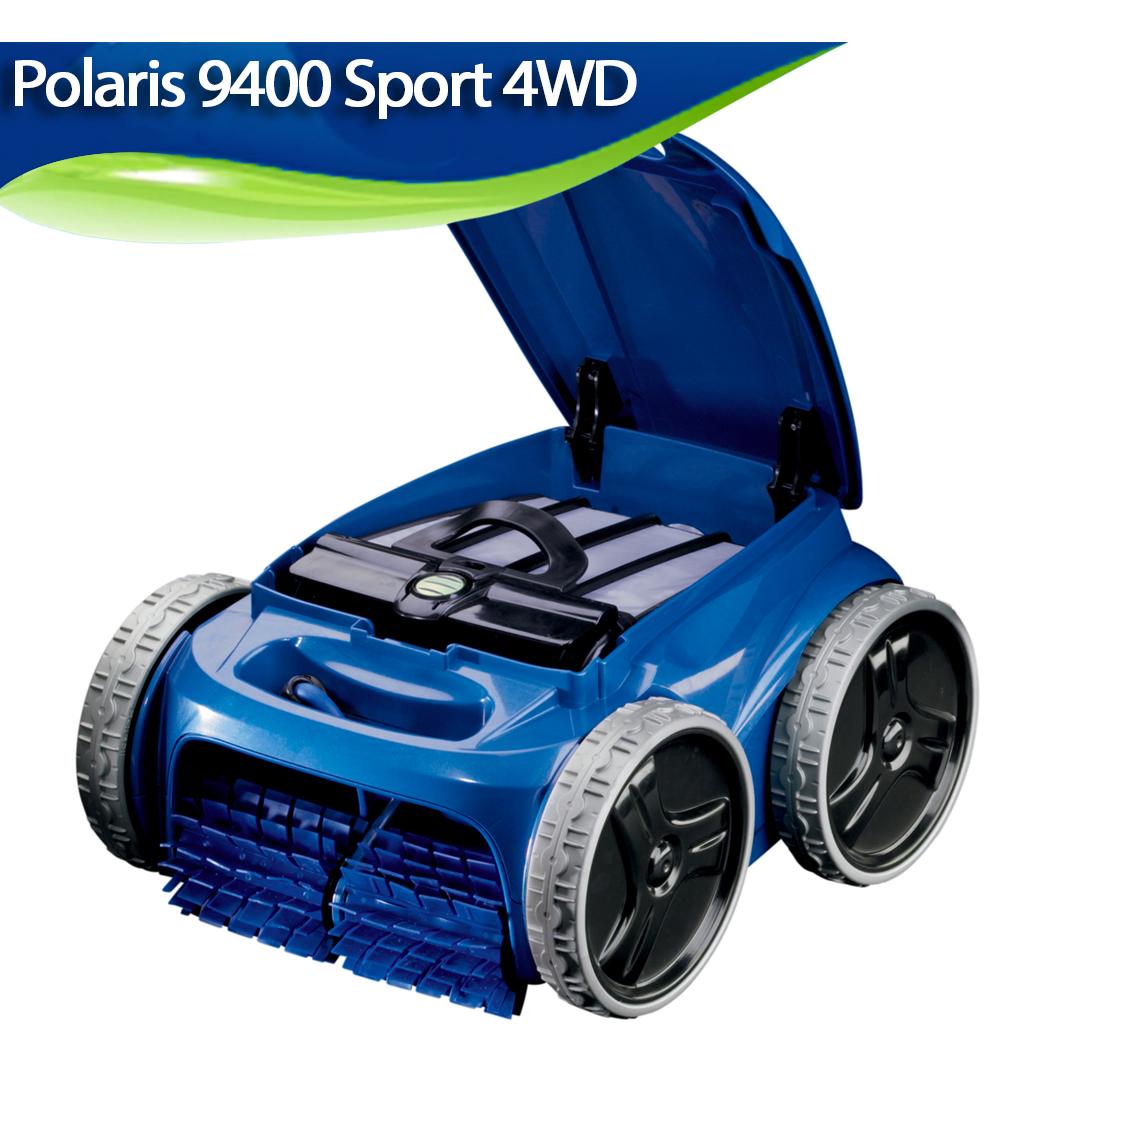 Polaris 9400 Sport 4WD review